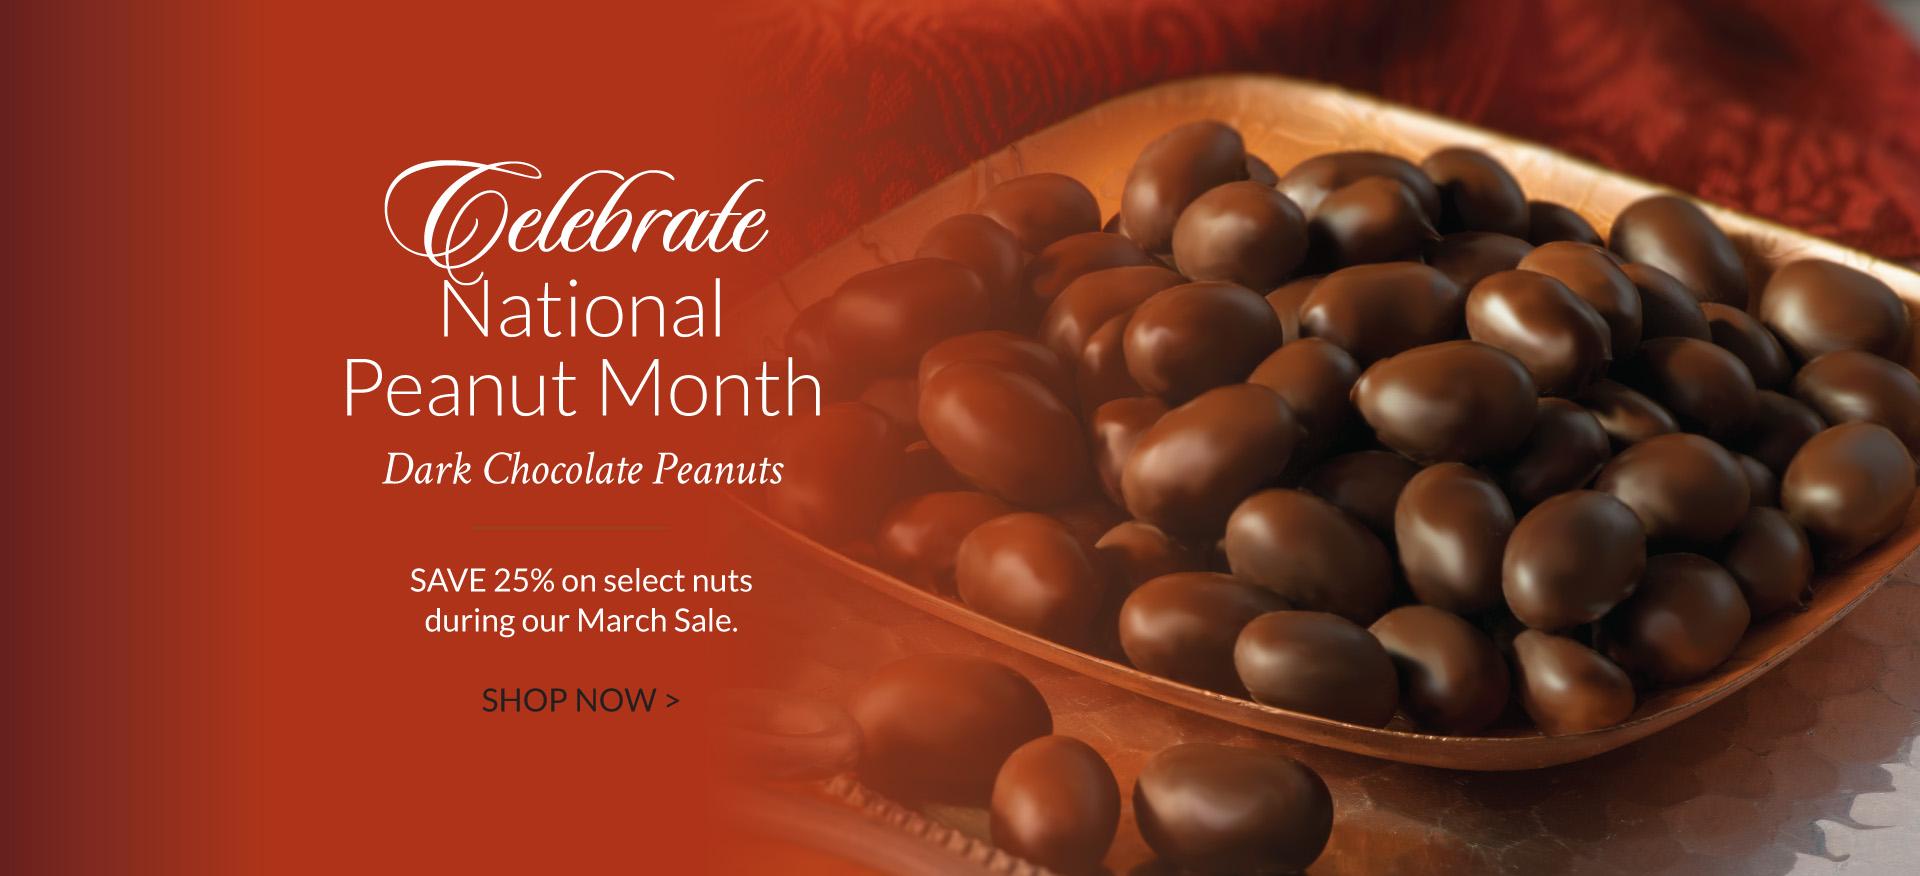 Dark Chocolate Peanuts